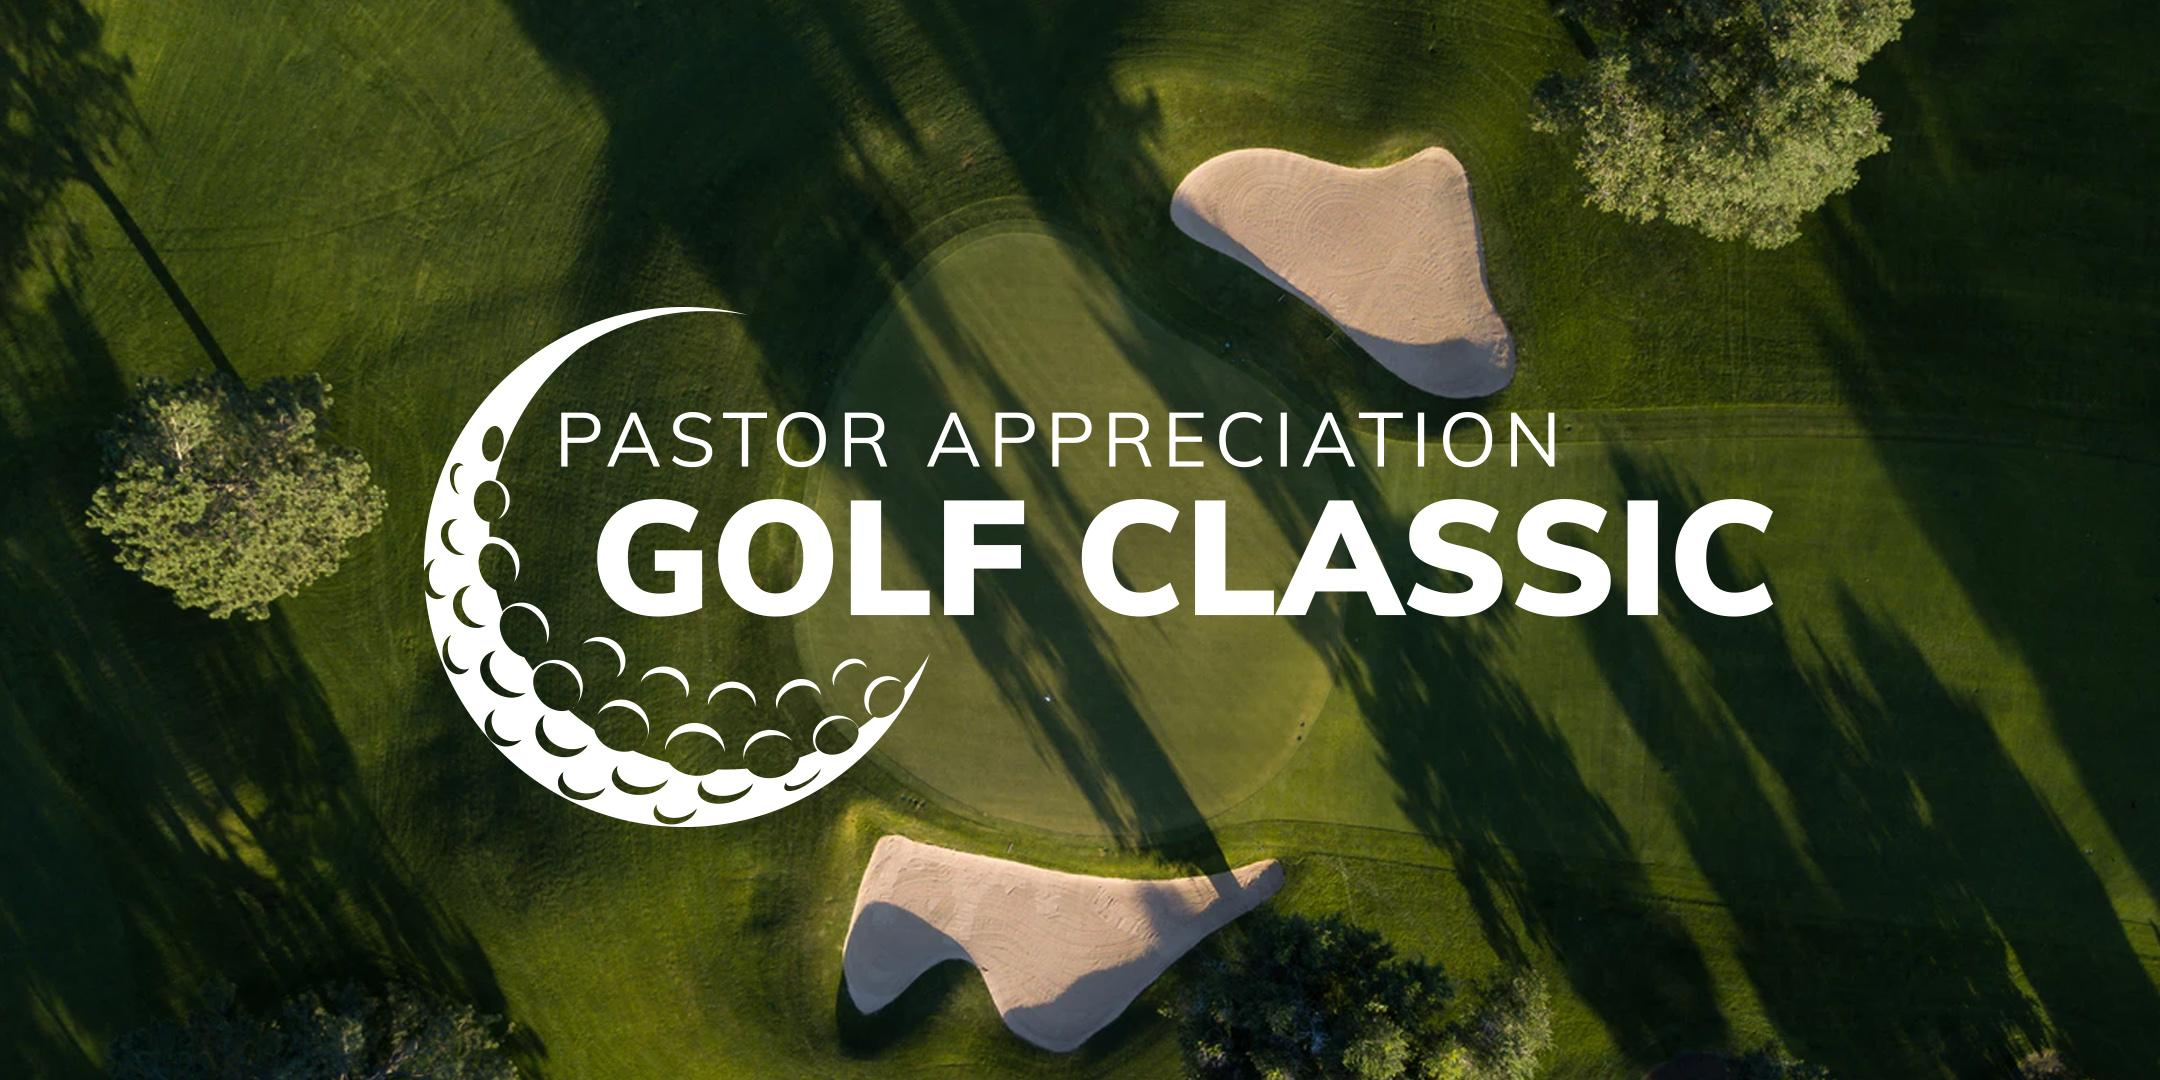 89.3 the River's Pastor Appreciation Golf Classic